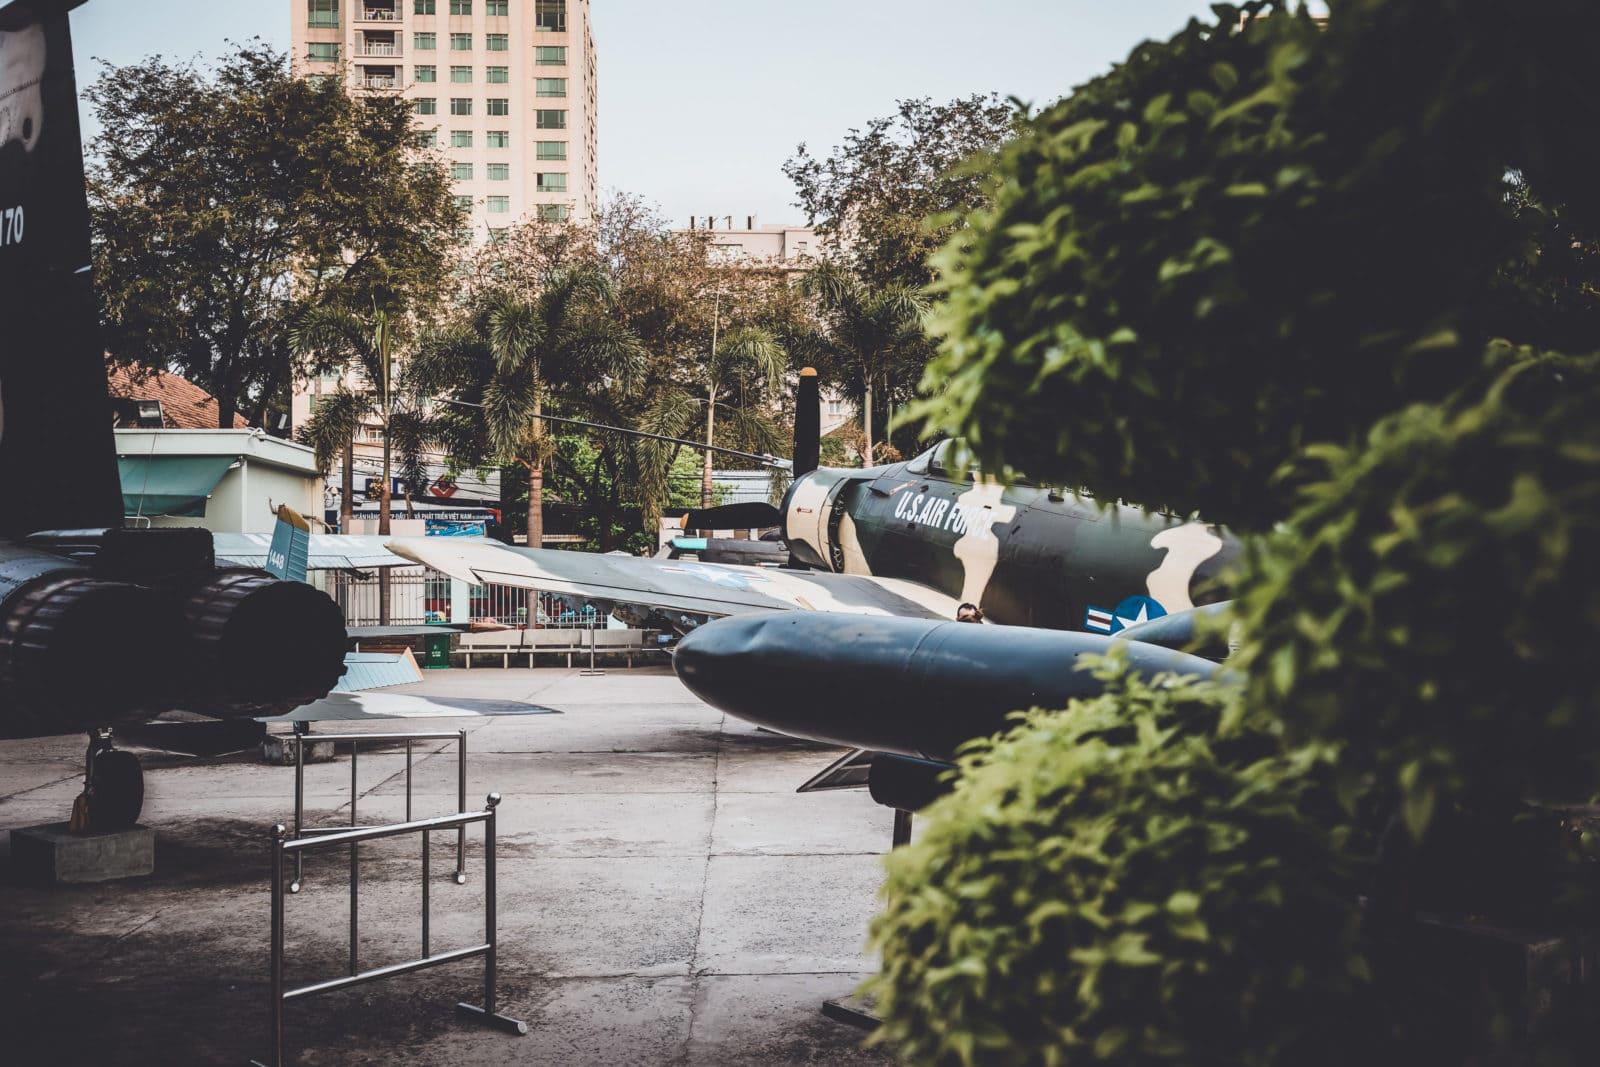 Kriegsflugzeuge im War Remnants Museum, Saigon